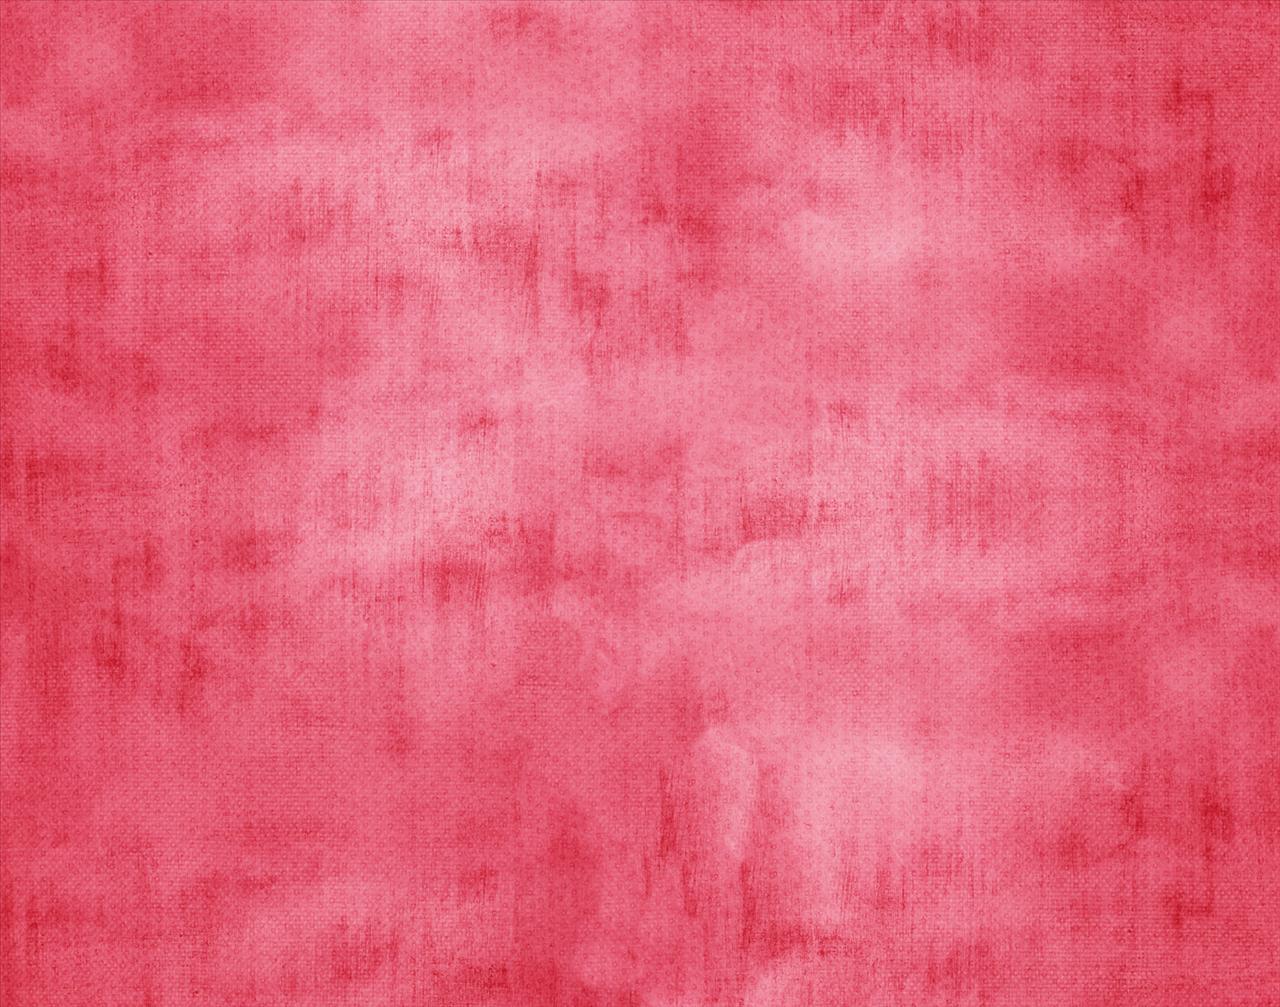 Rosa Gradiente Fundos HD Download Gradiente Plain Pink Pink Plain